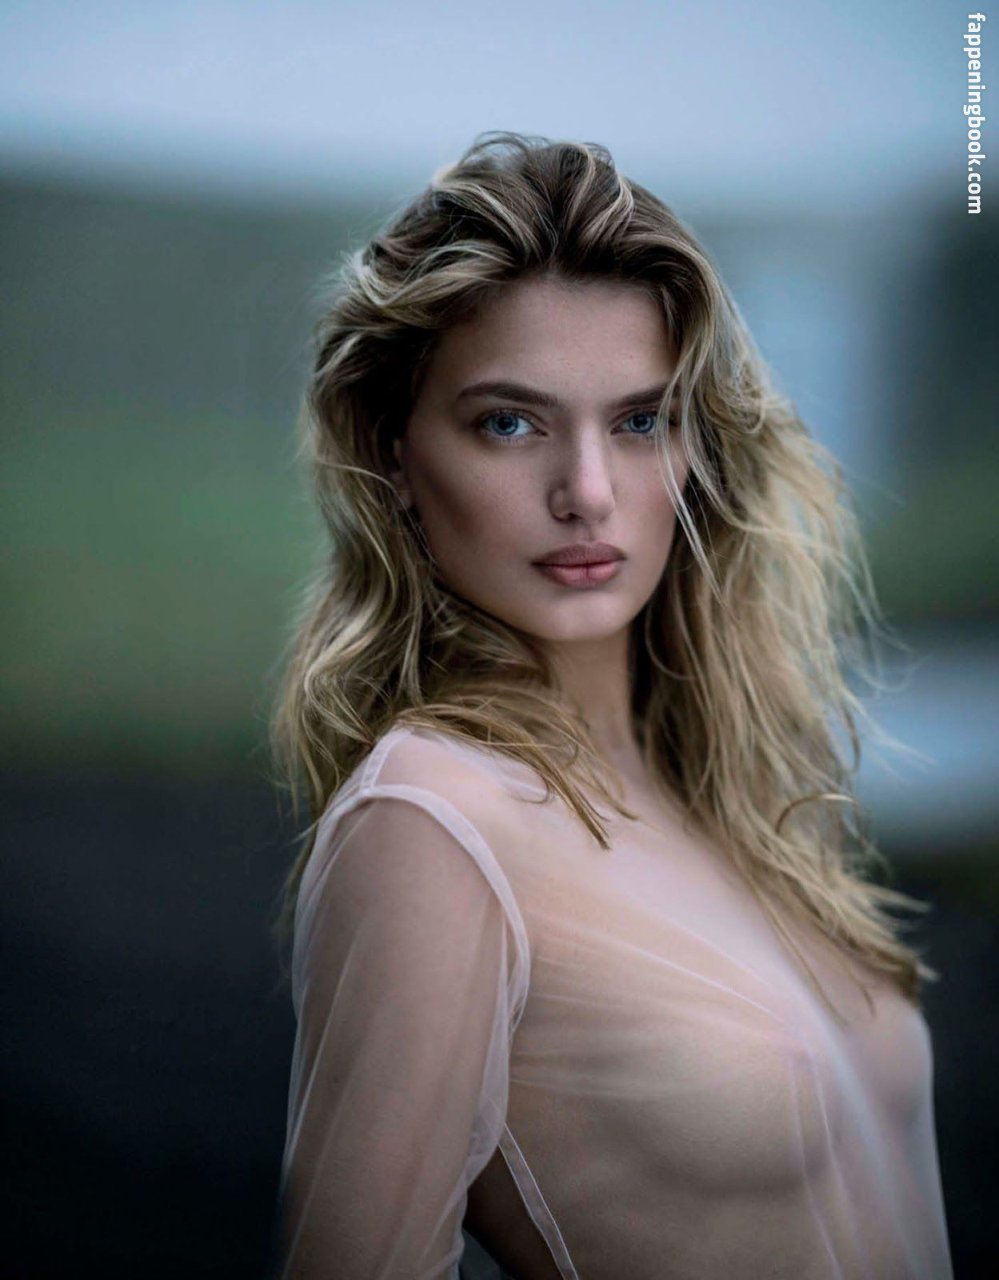 Bregje Heinen Nude, Sexy, The Fappening, Uncensored